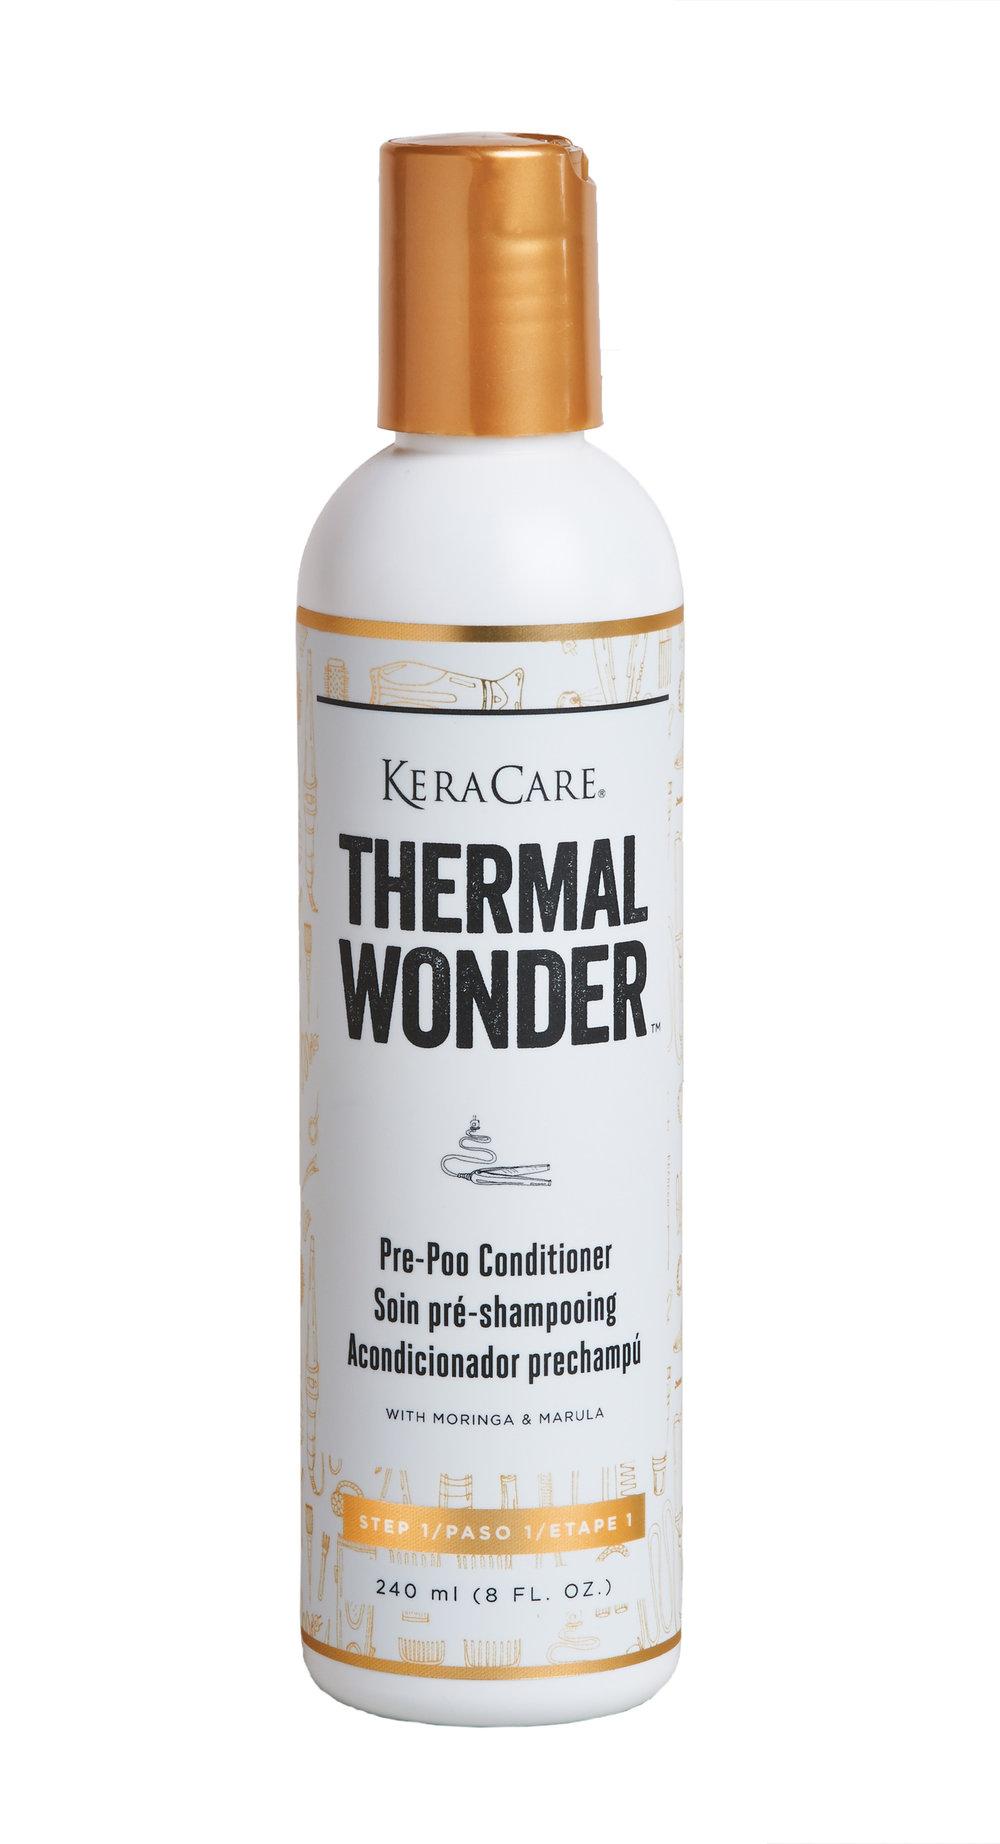 Thermal Wonder ™ Pre-Poo Conditioner